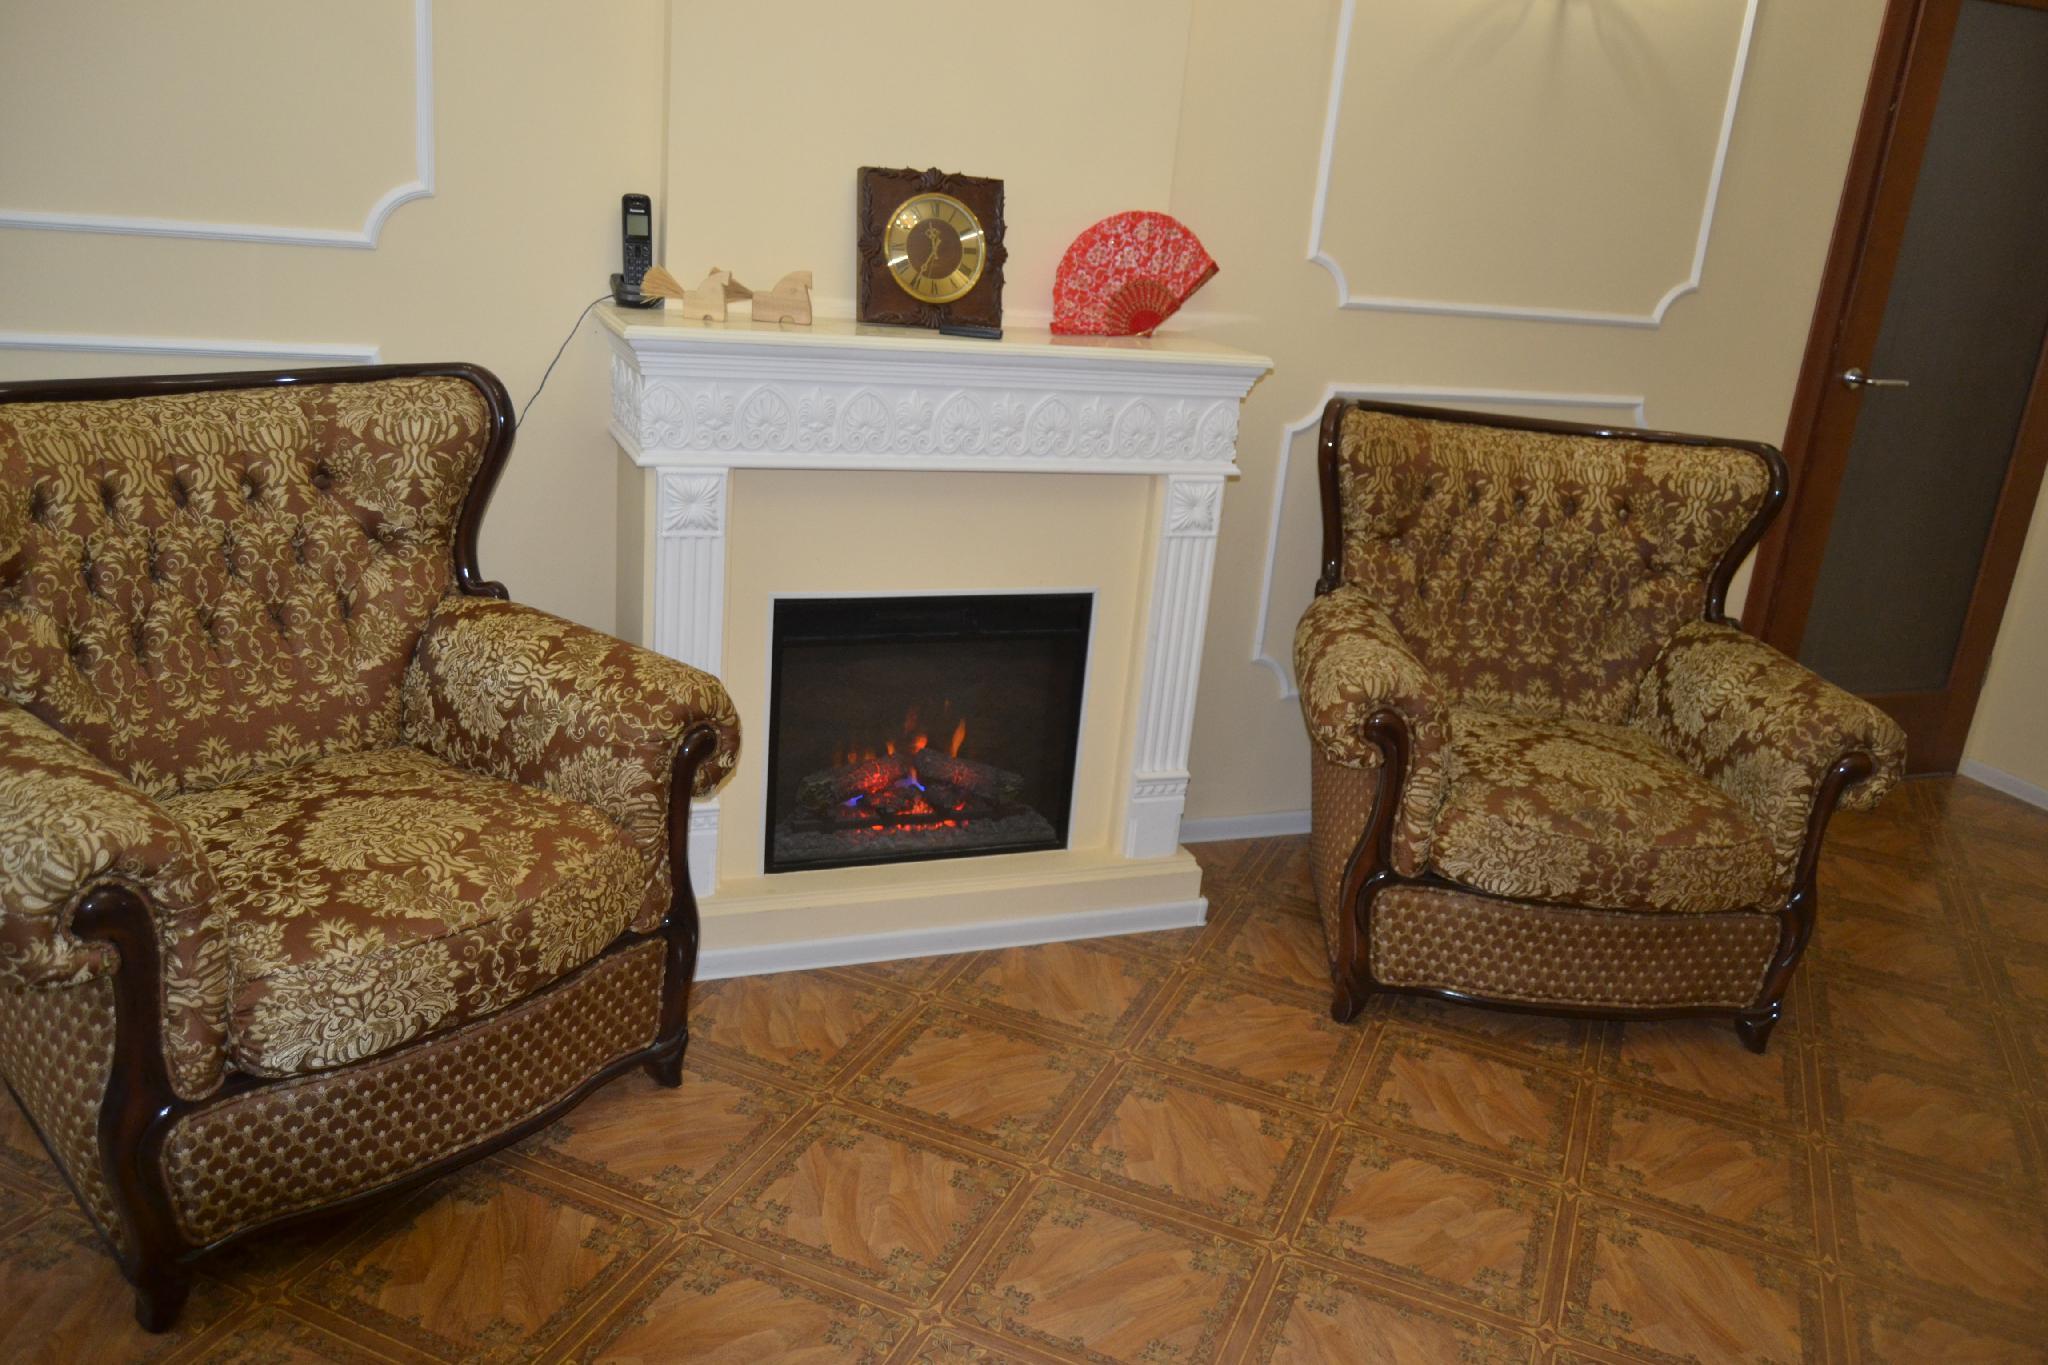 3 Room Apartment In Saransk